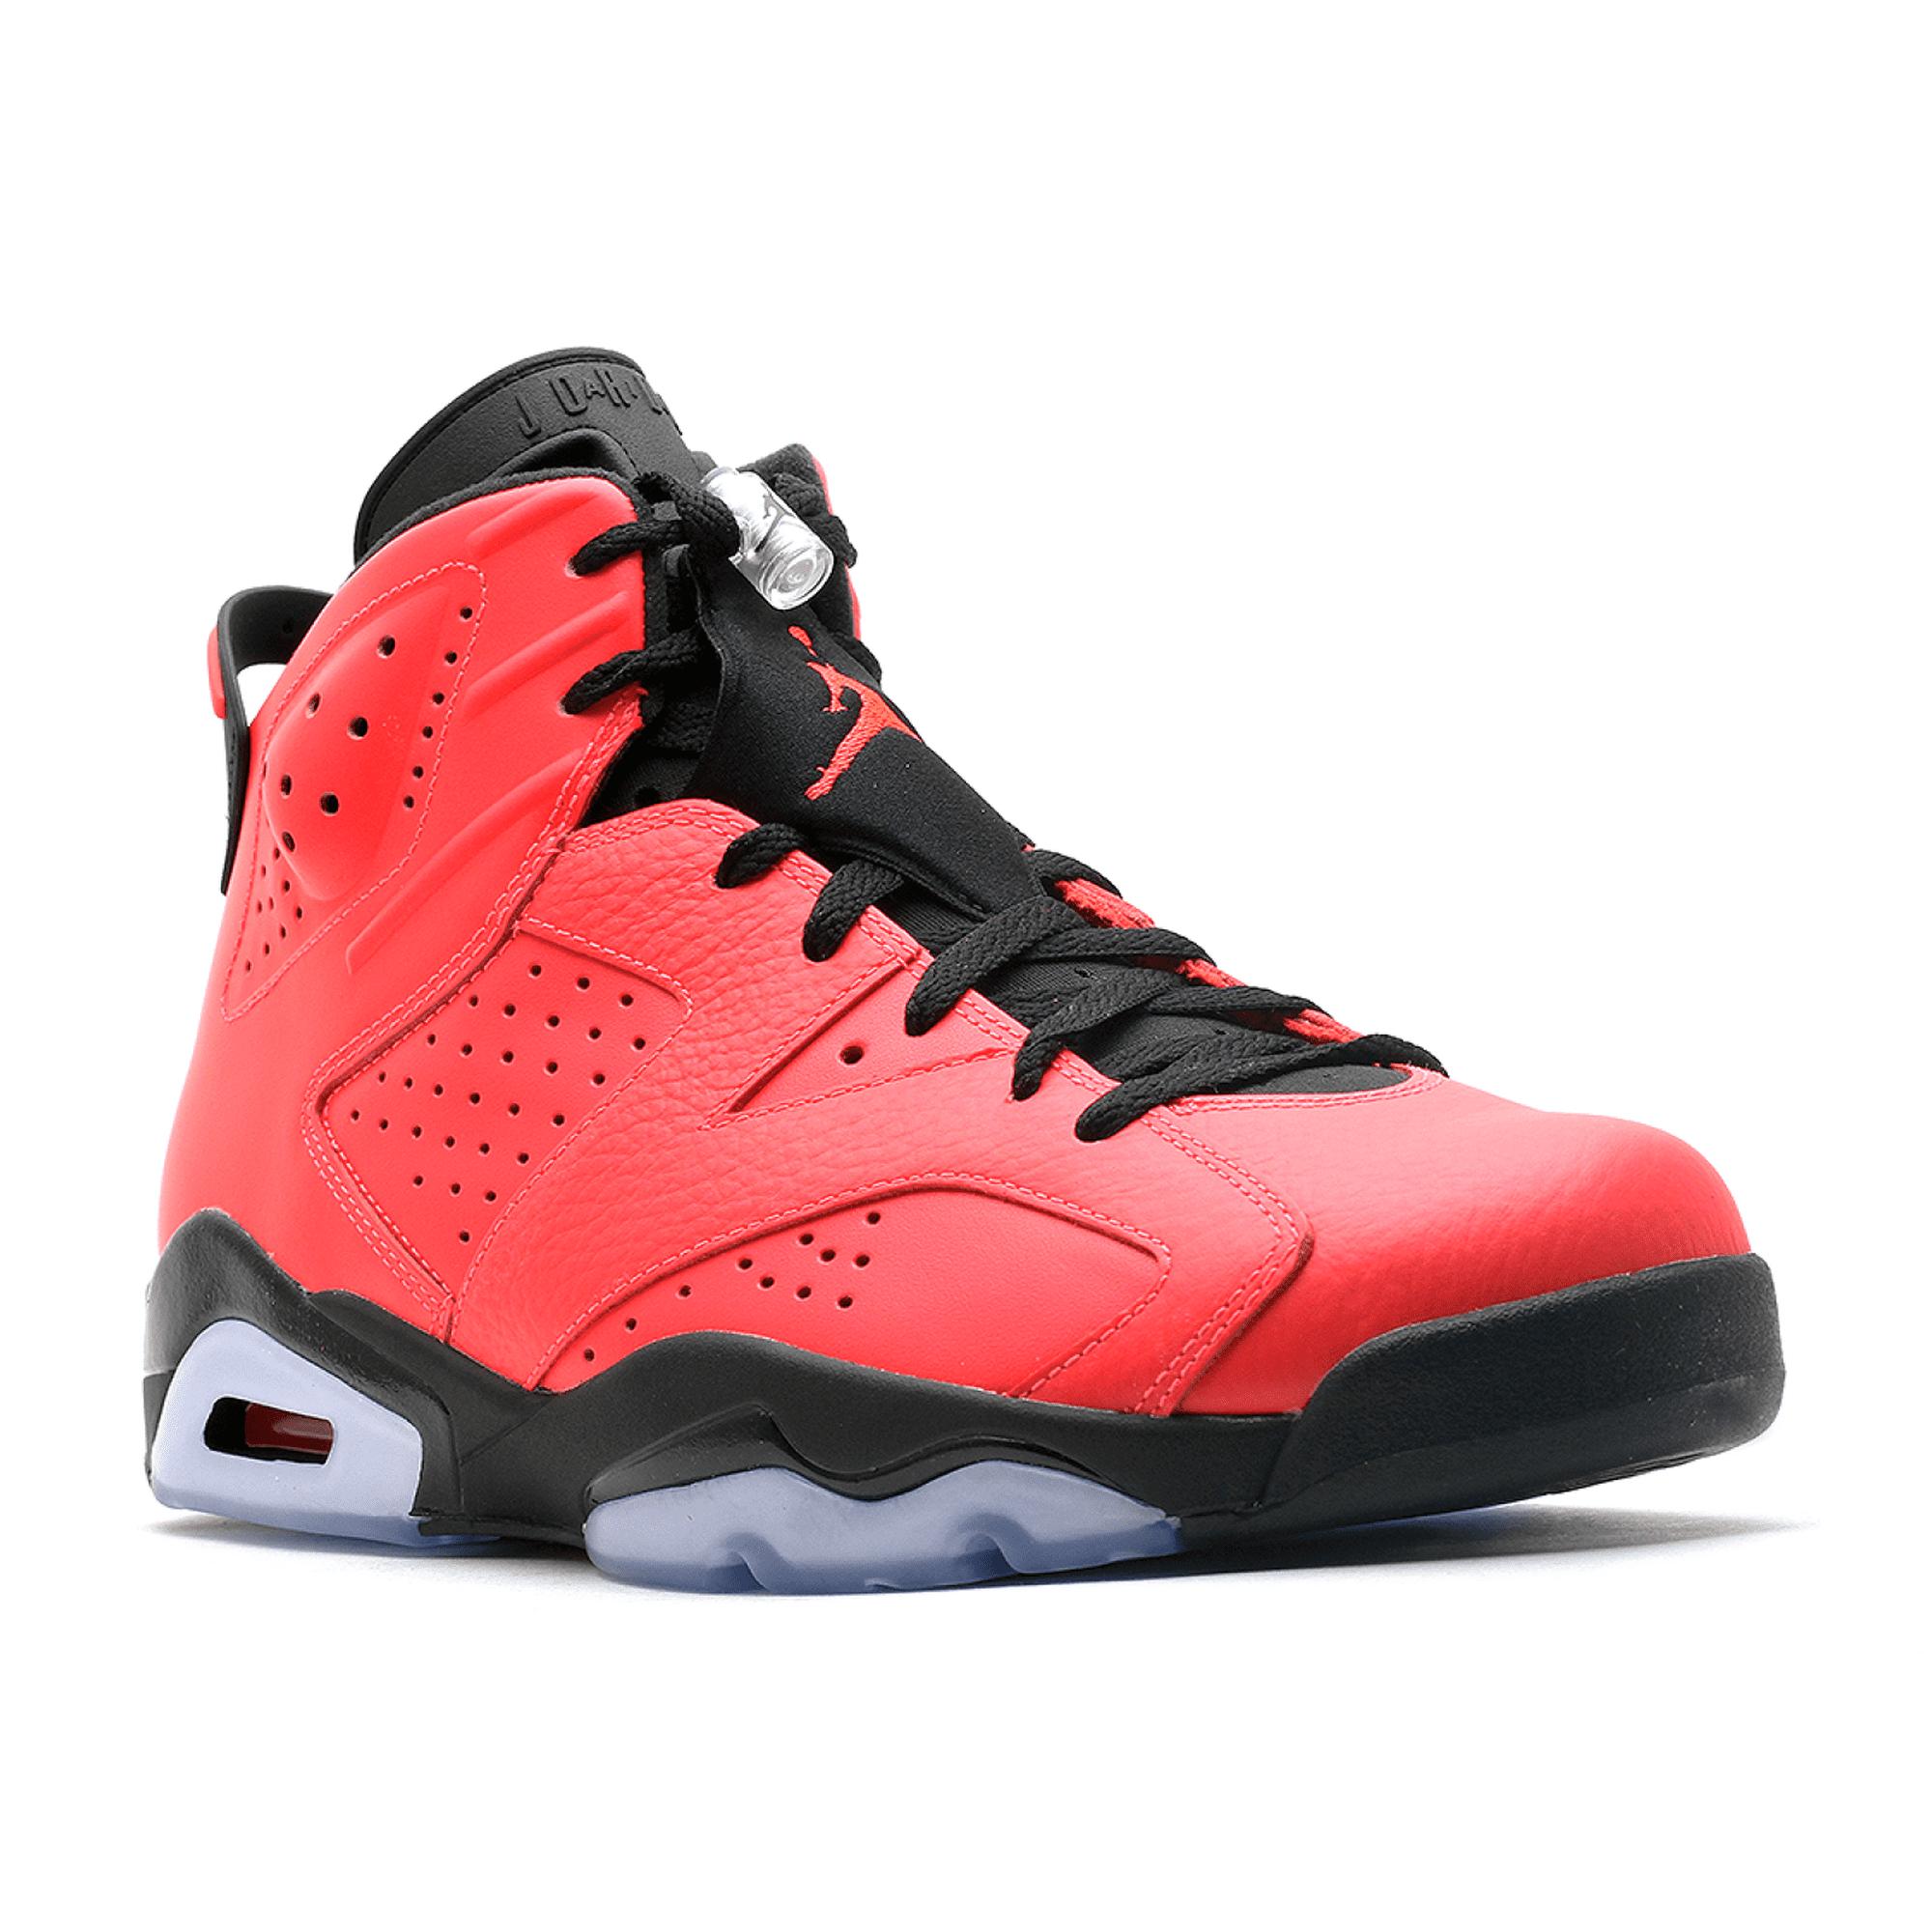 buy popular de8ec 3e286 Air Jordan - Men - Air Jordan 6 Retro  Infrared 23  - 384664-623 - Size 11    Walmart Canada